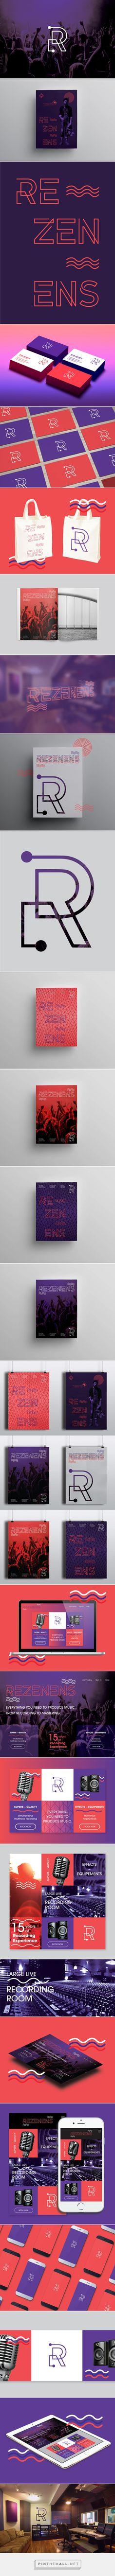 » REZENENS — Branding   Art Direction   Web Design on Behance - created via http://pinthemall.net